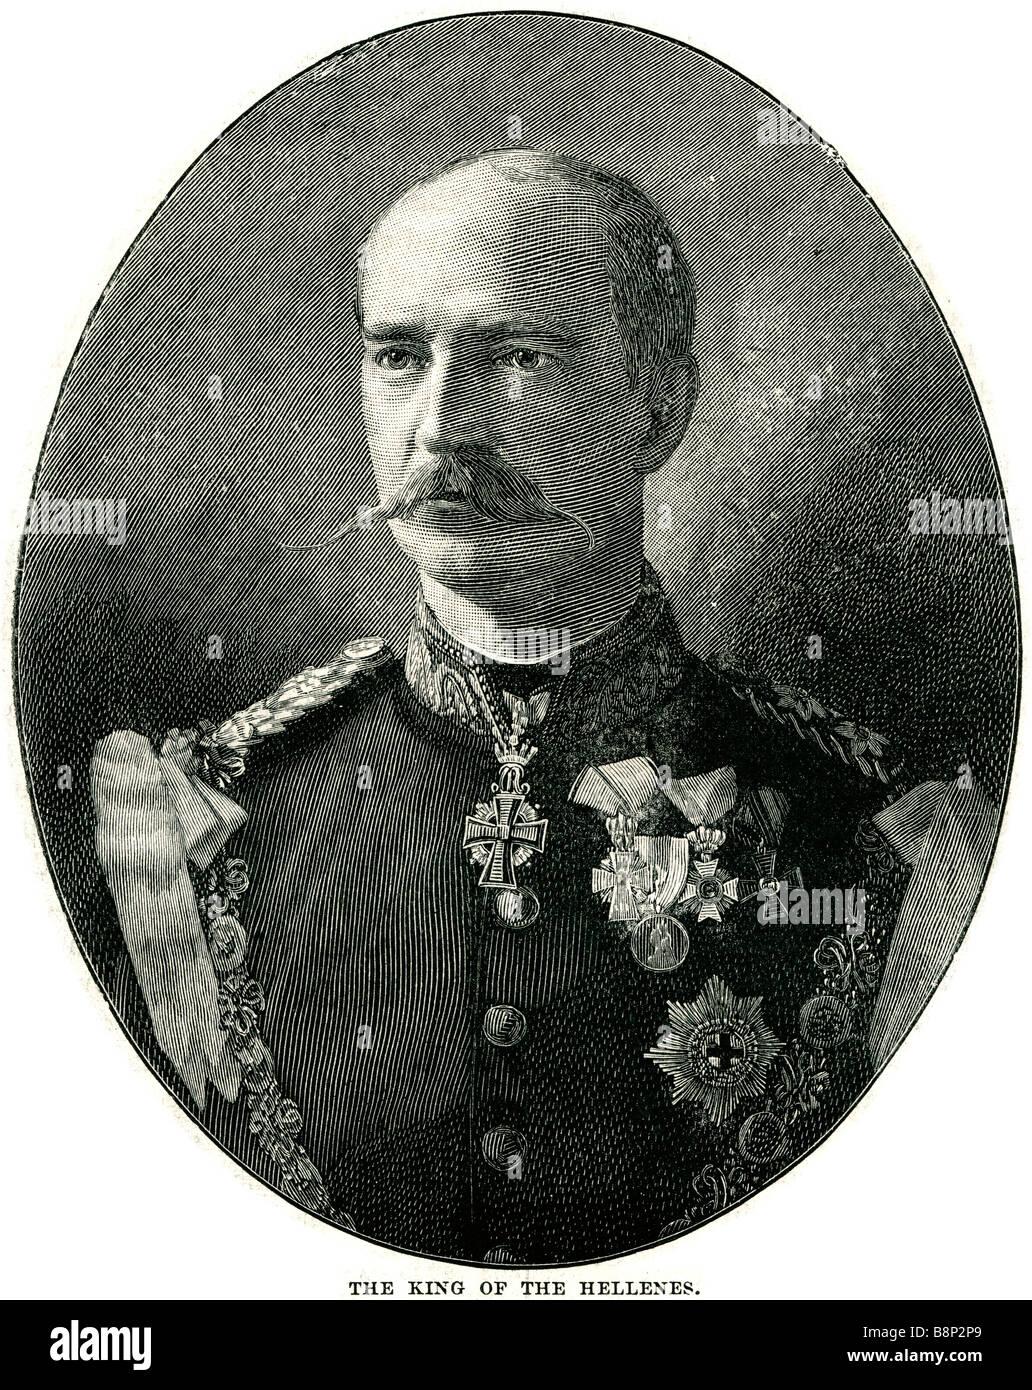 George I Greek king of the Hellenes 1845 1913 Greece Danish prince - Stock Image